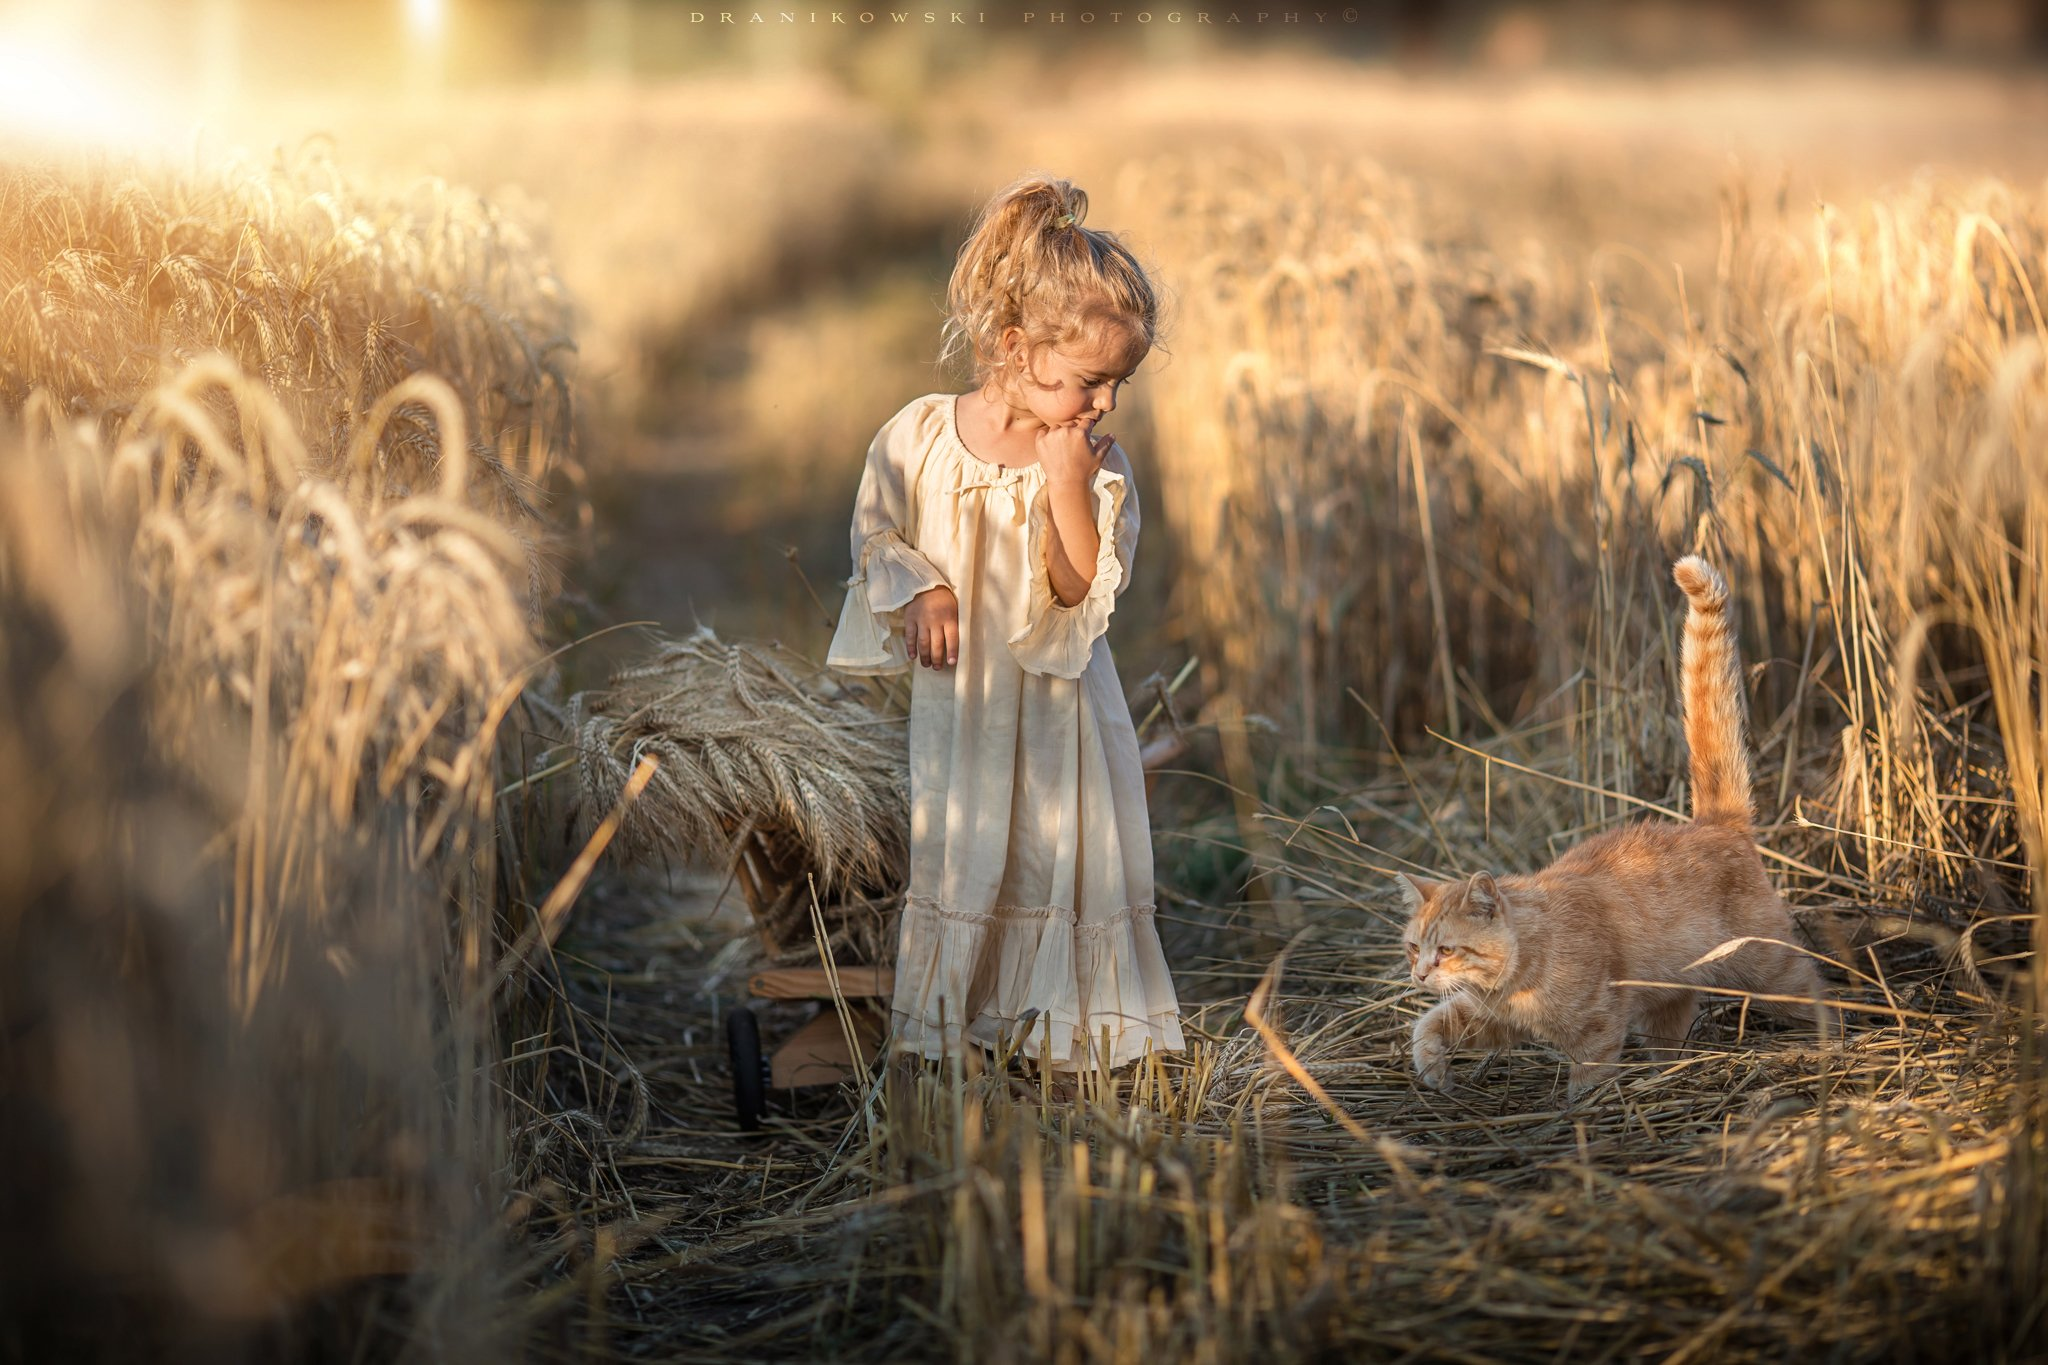 сбор урожая с кошкой harvest cat little girl grain sunlight marie dranikowski 135mm cute dziewczynka, Radoslaw Dranikowski